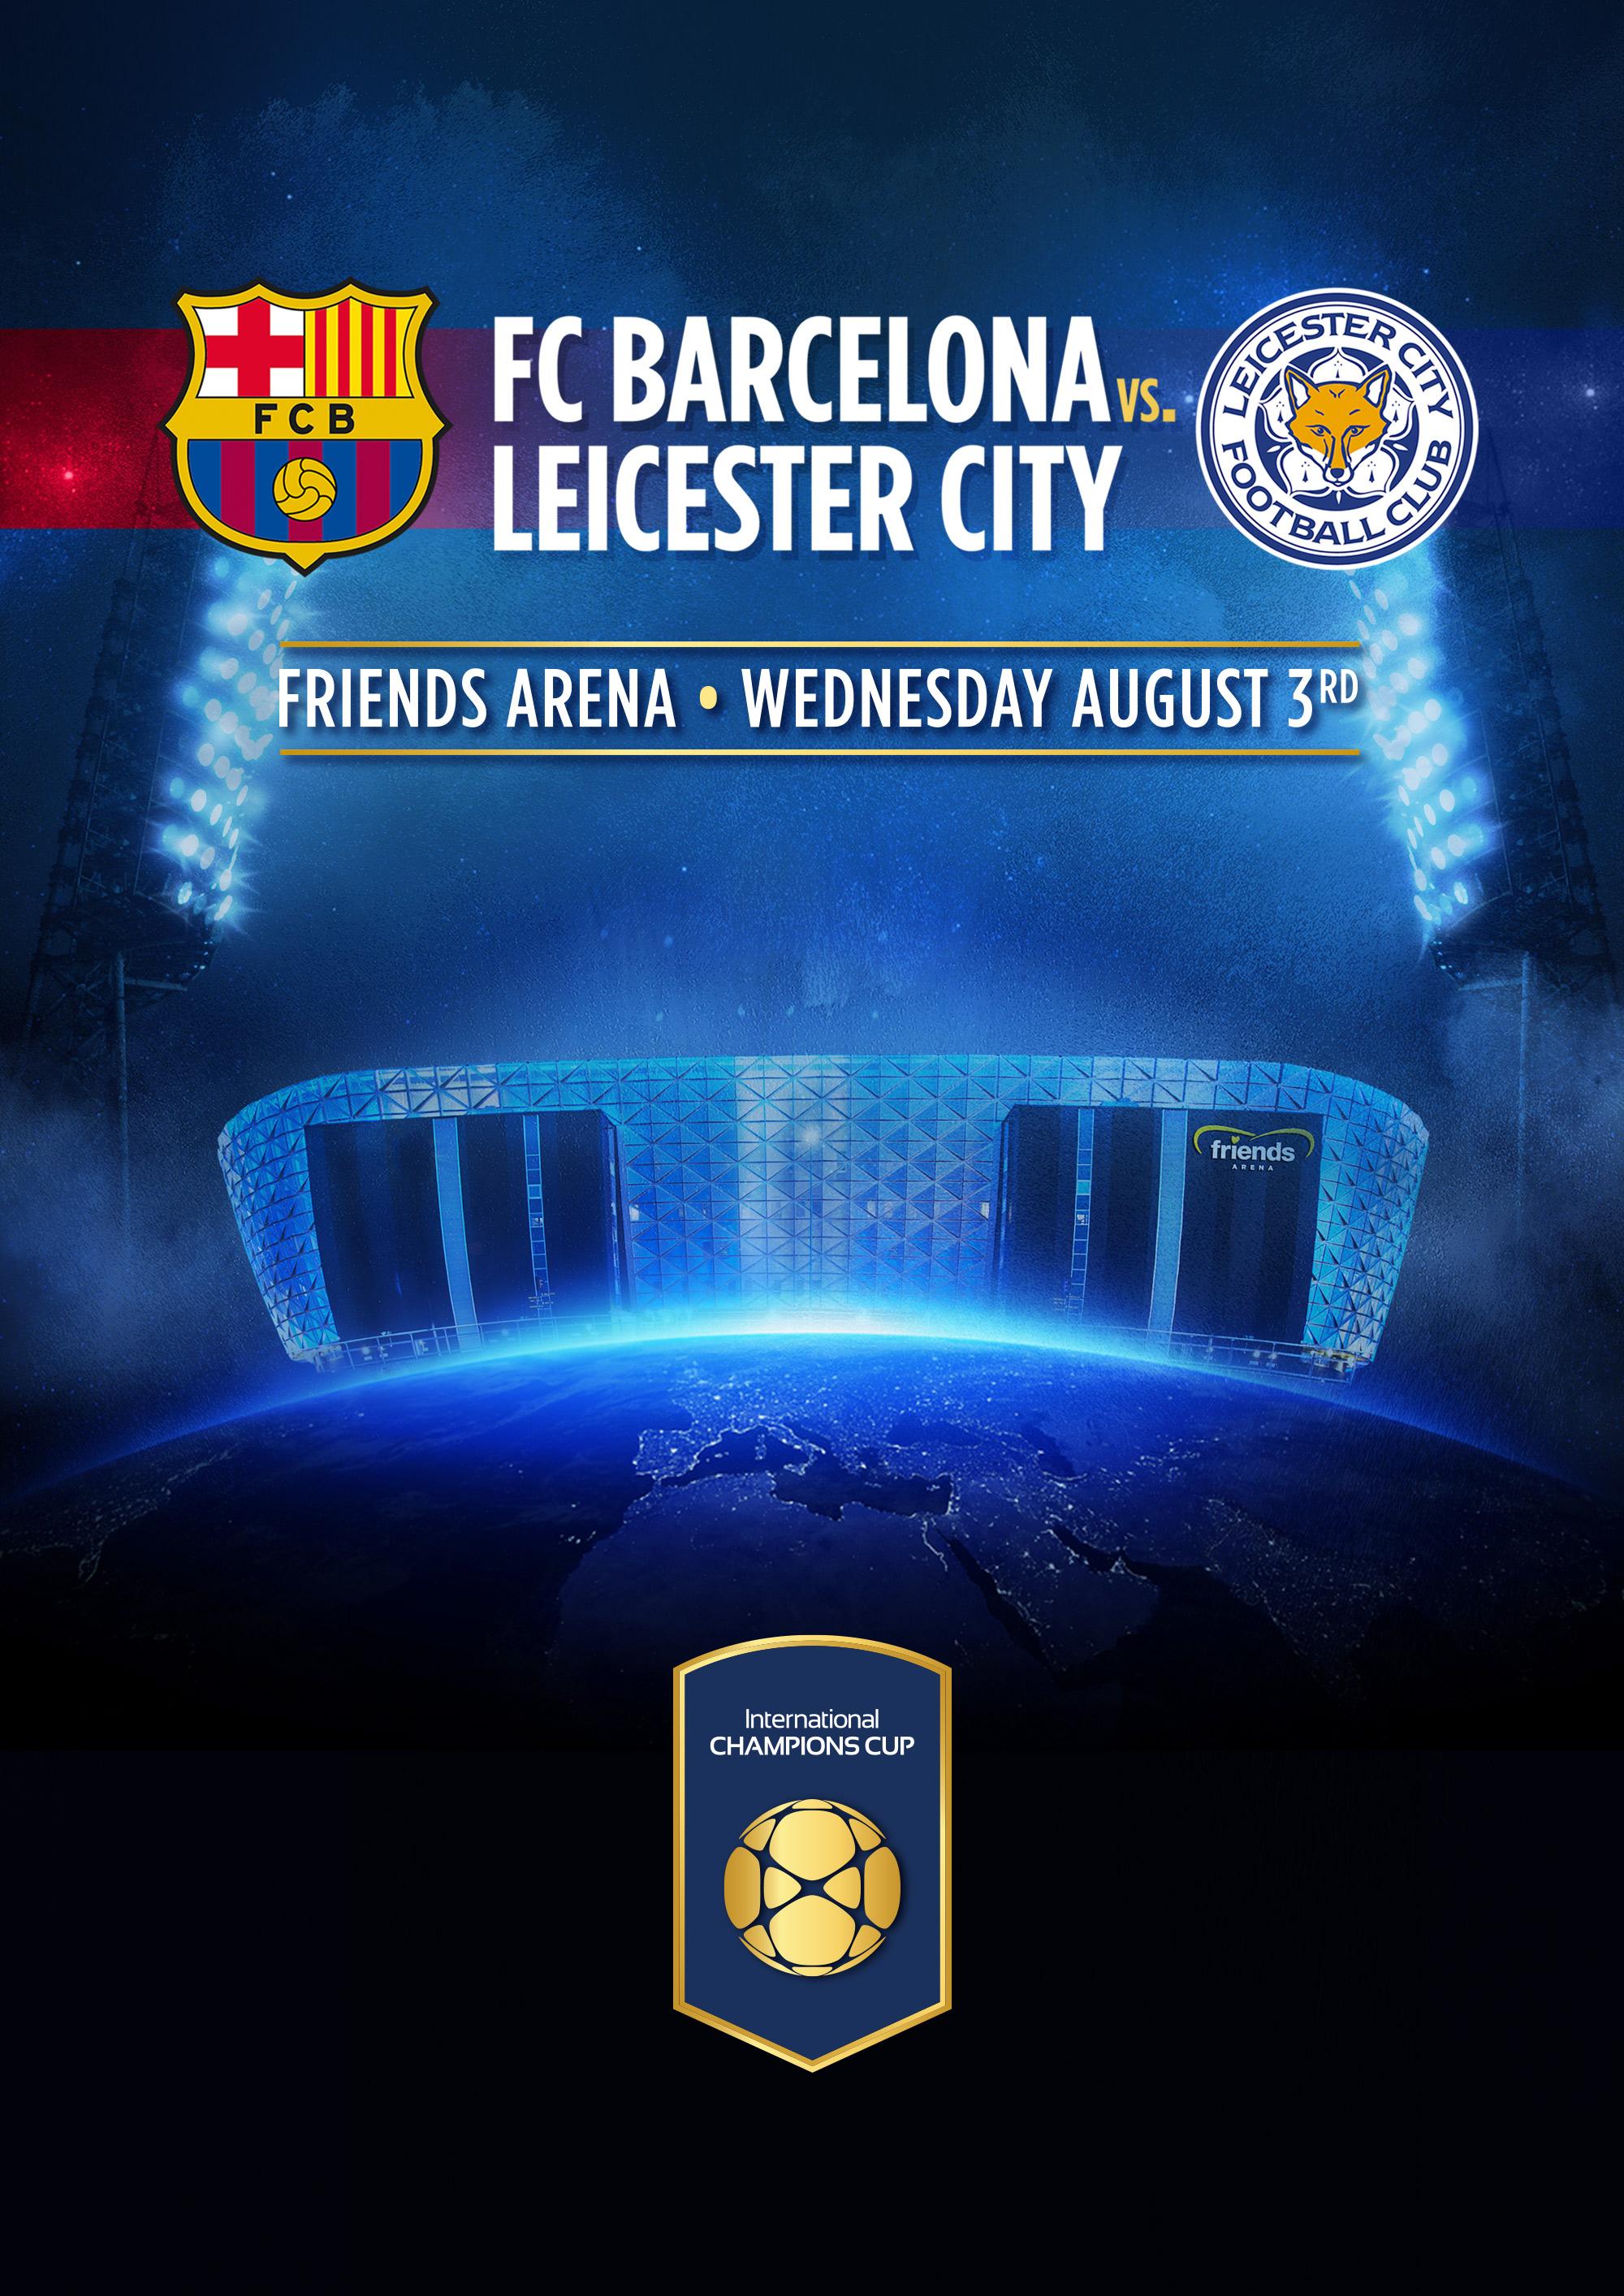 FC Barcelona vs. Leicester City